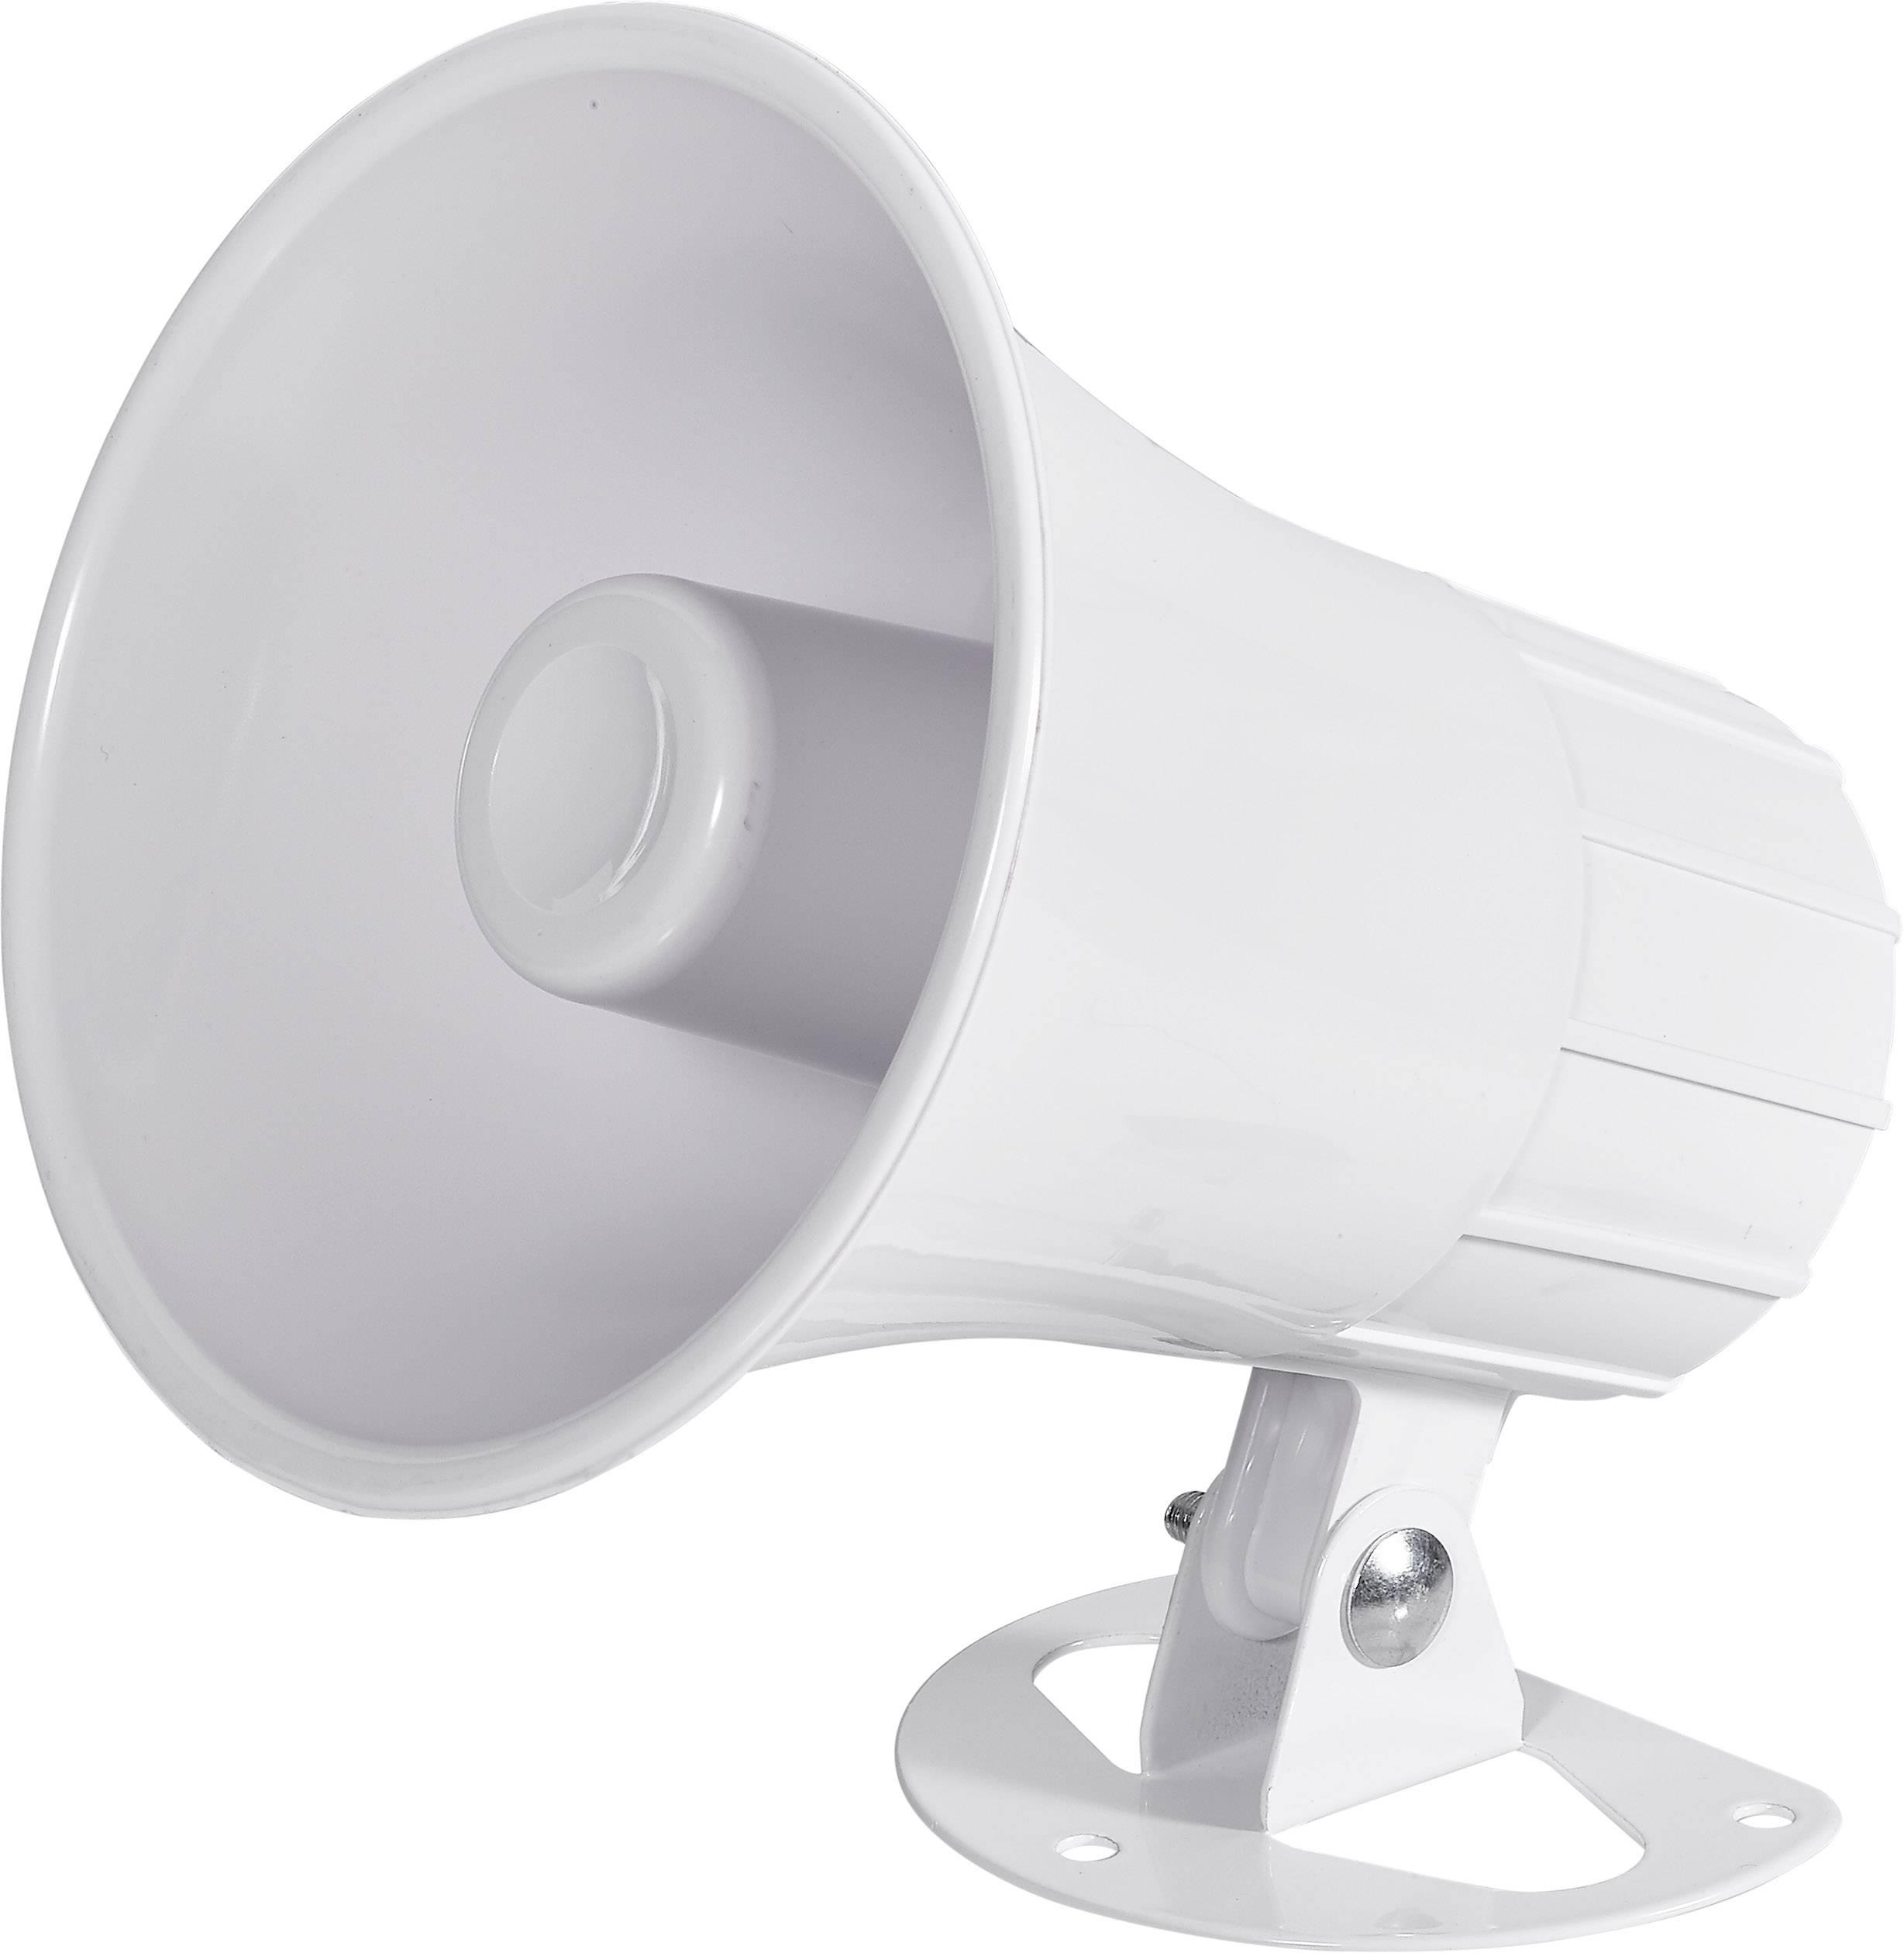 Alarmová siréna, 105 dB/1 m, 12 V/DC